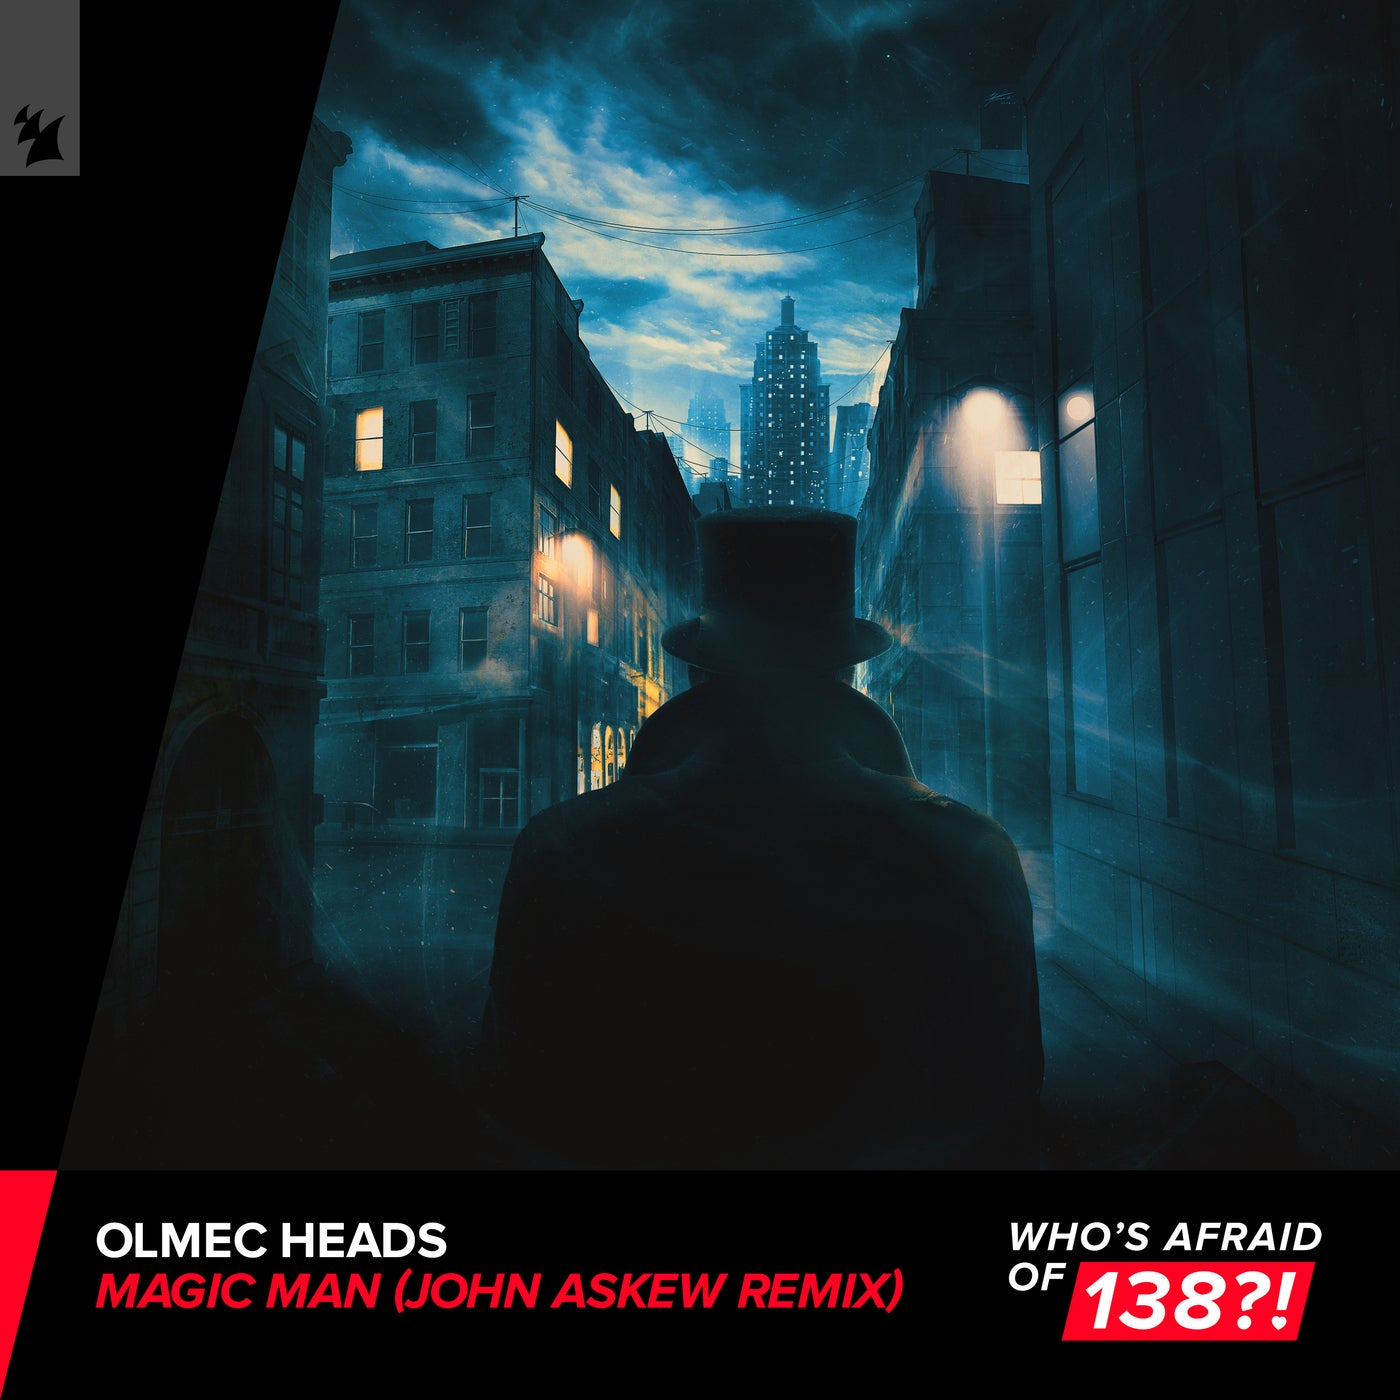 Magic Man (John Askew Extended Remix)